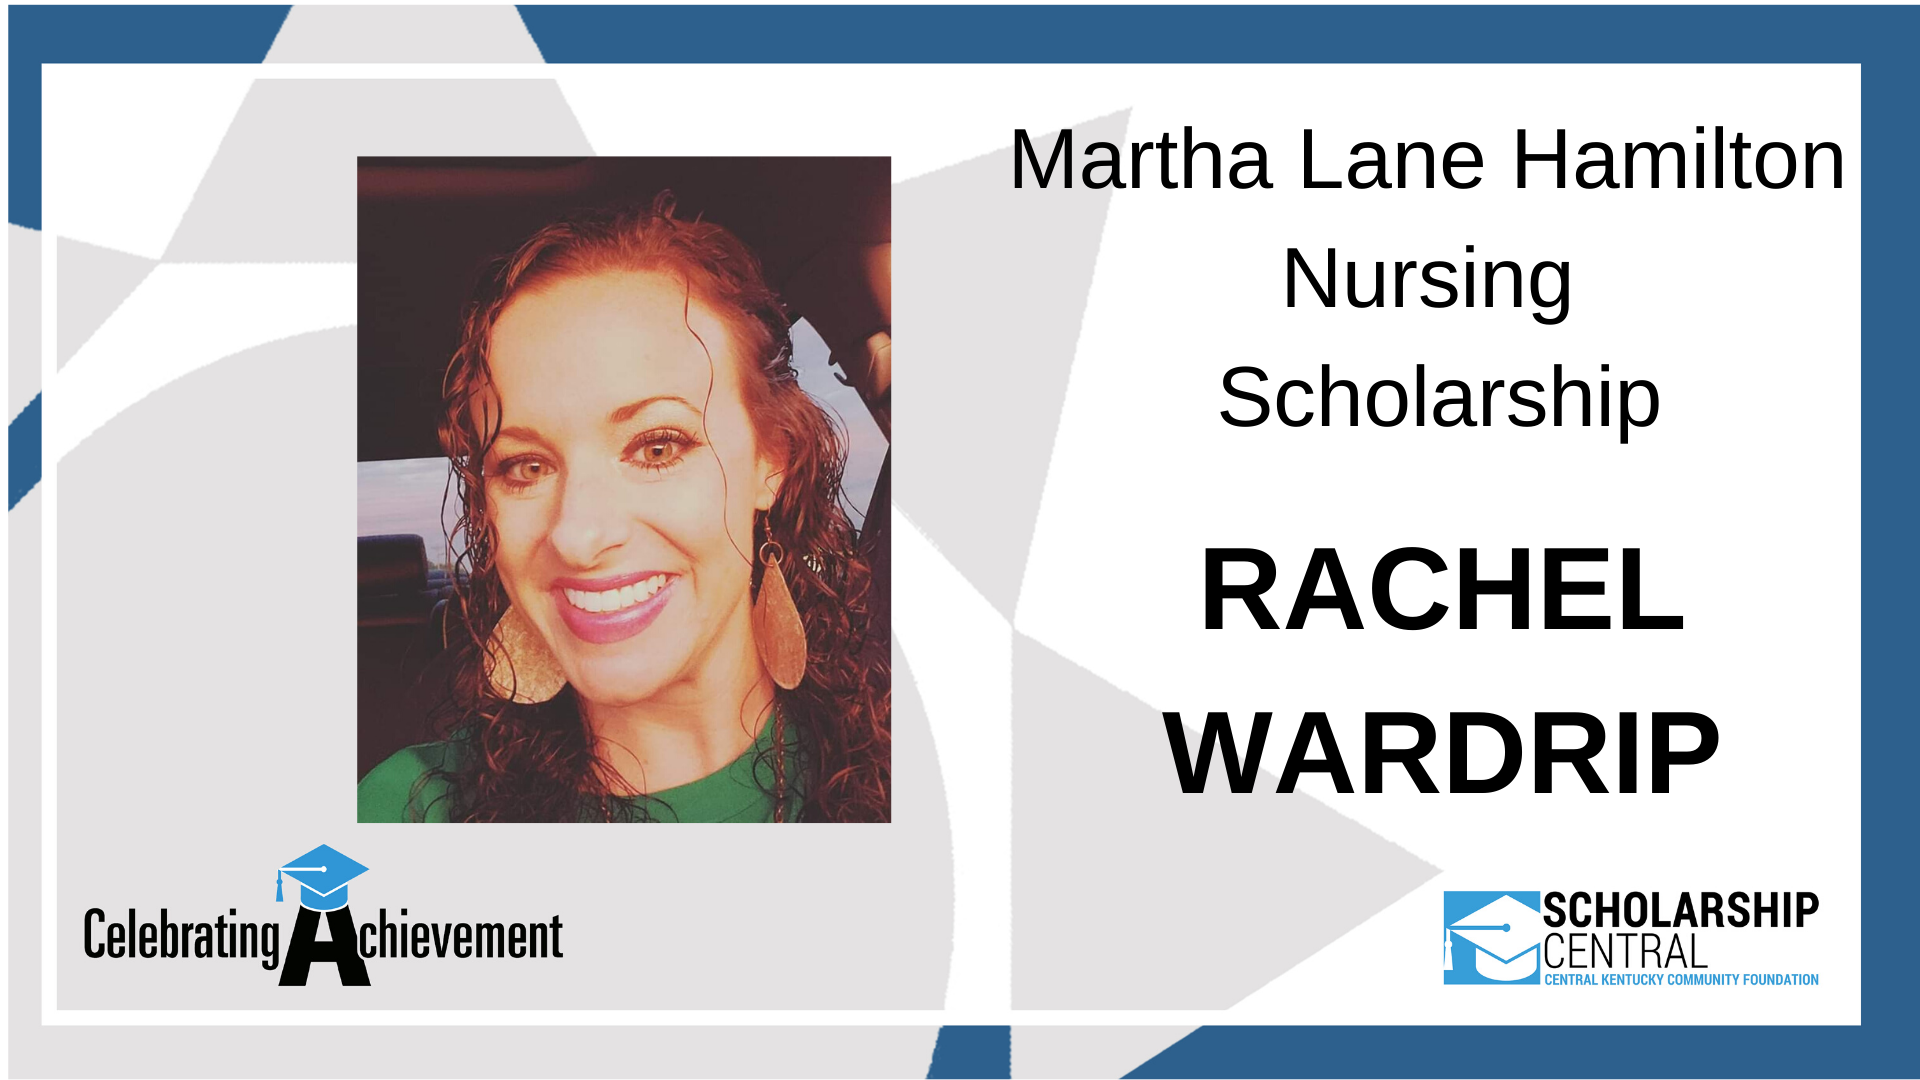 Martha Lane Hamilton Scholarship